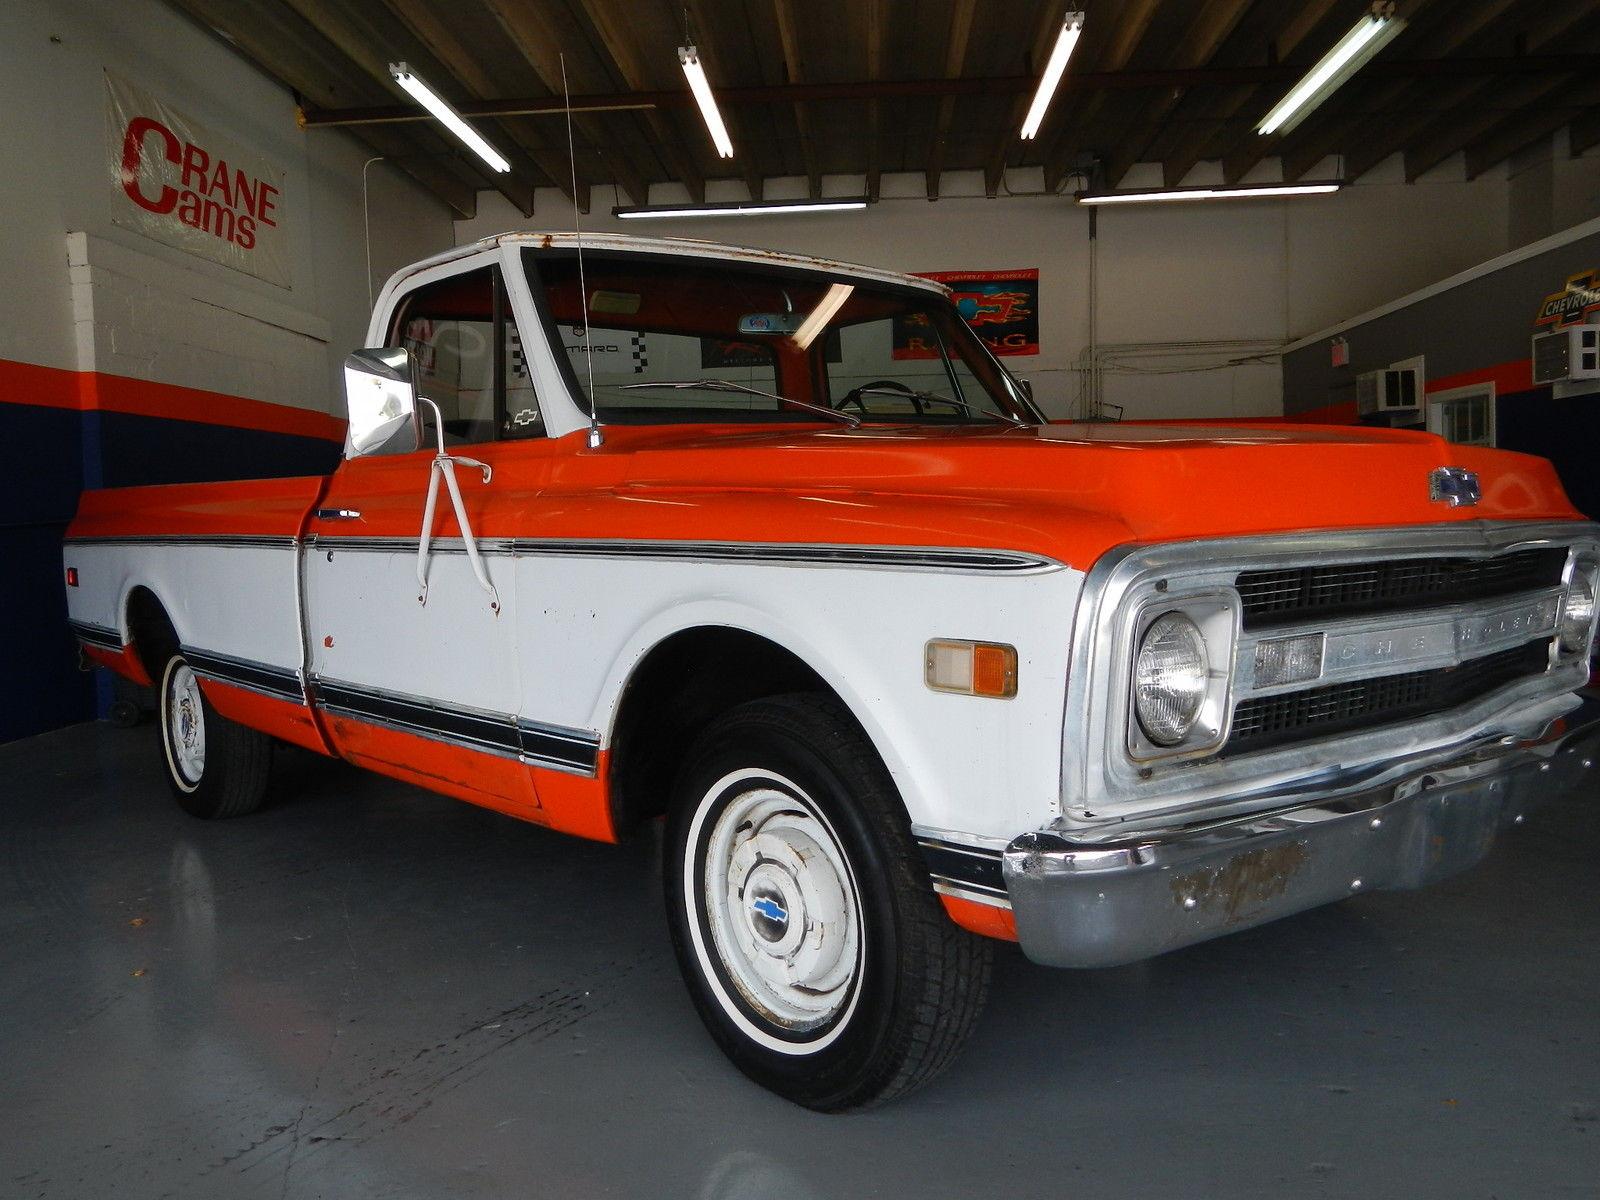 1970 Chevy C10 Lwb 100 Percent Original Truck Great Patina